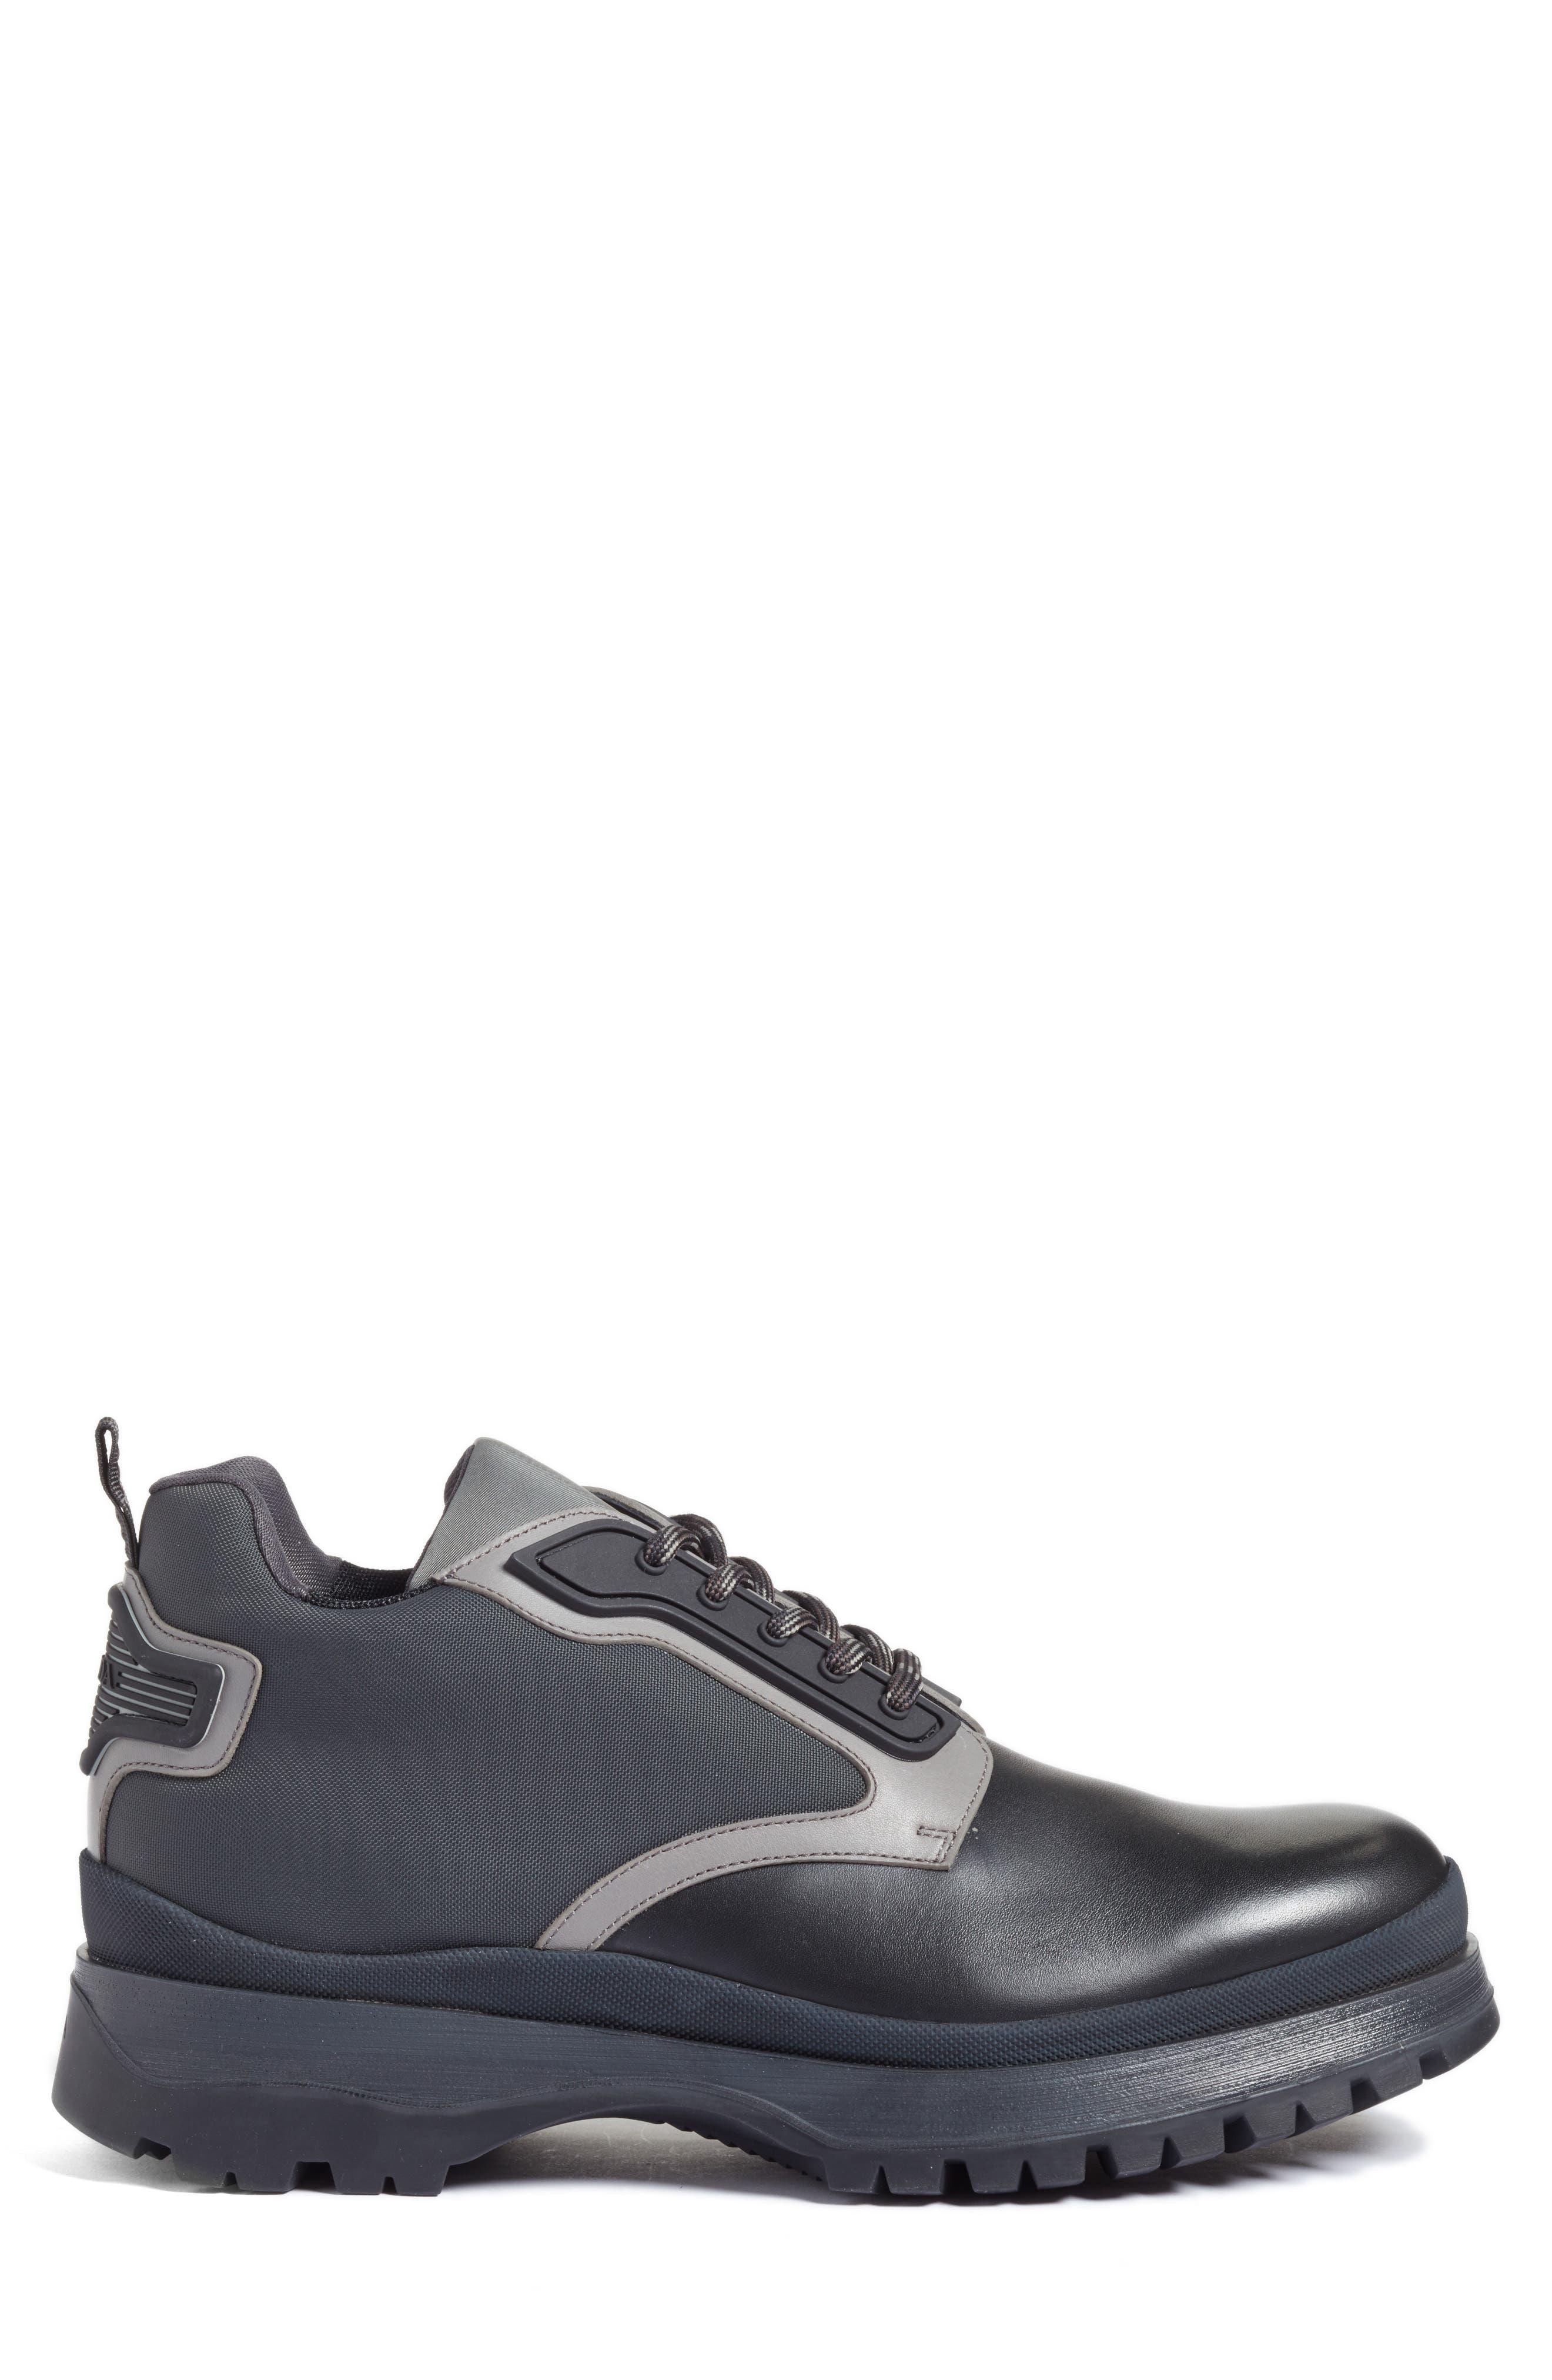 Tech Sneaker Boot,                             Alternate thumbnail 3, color,                             007